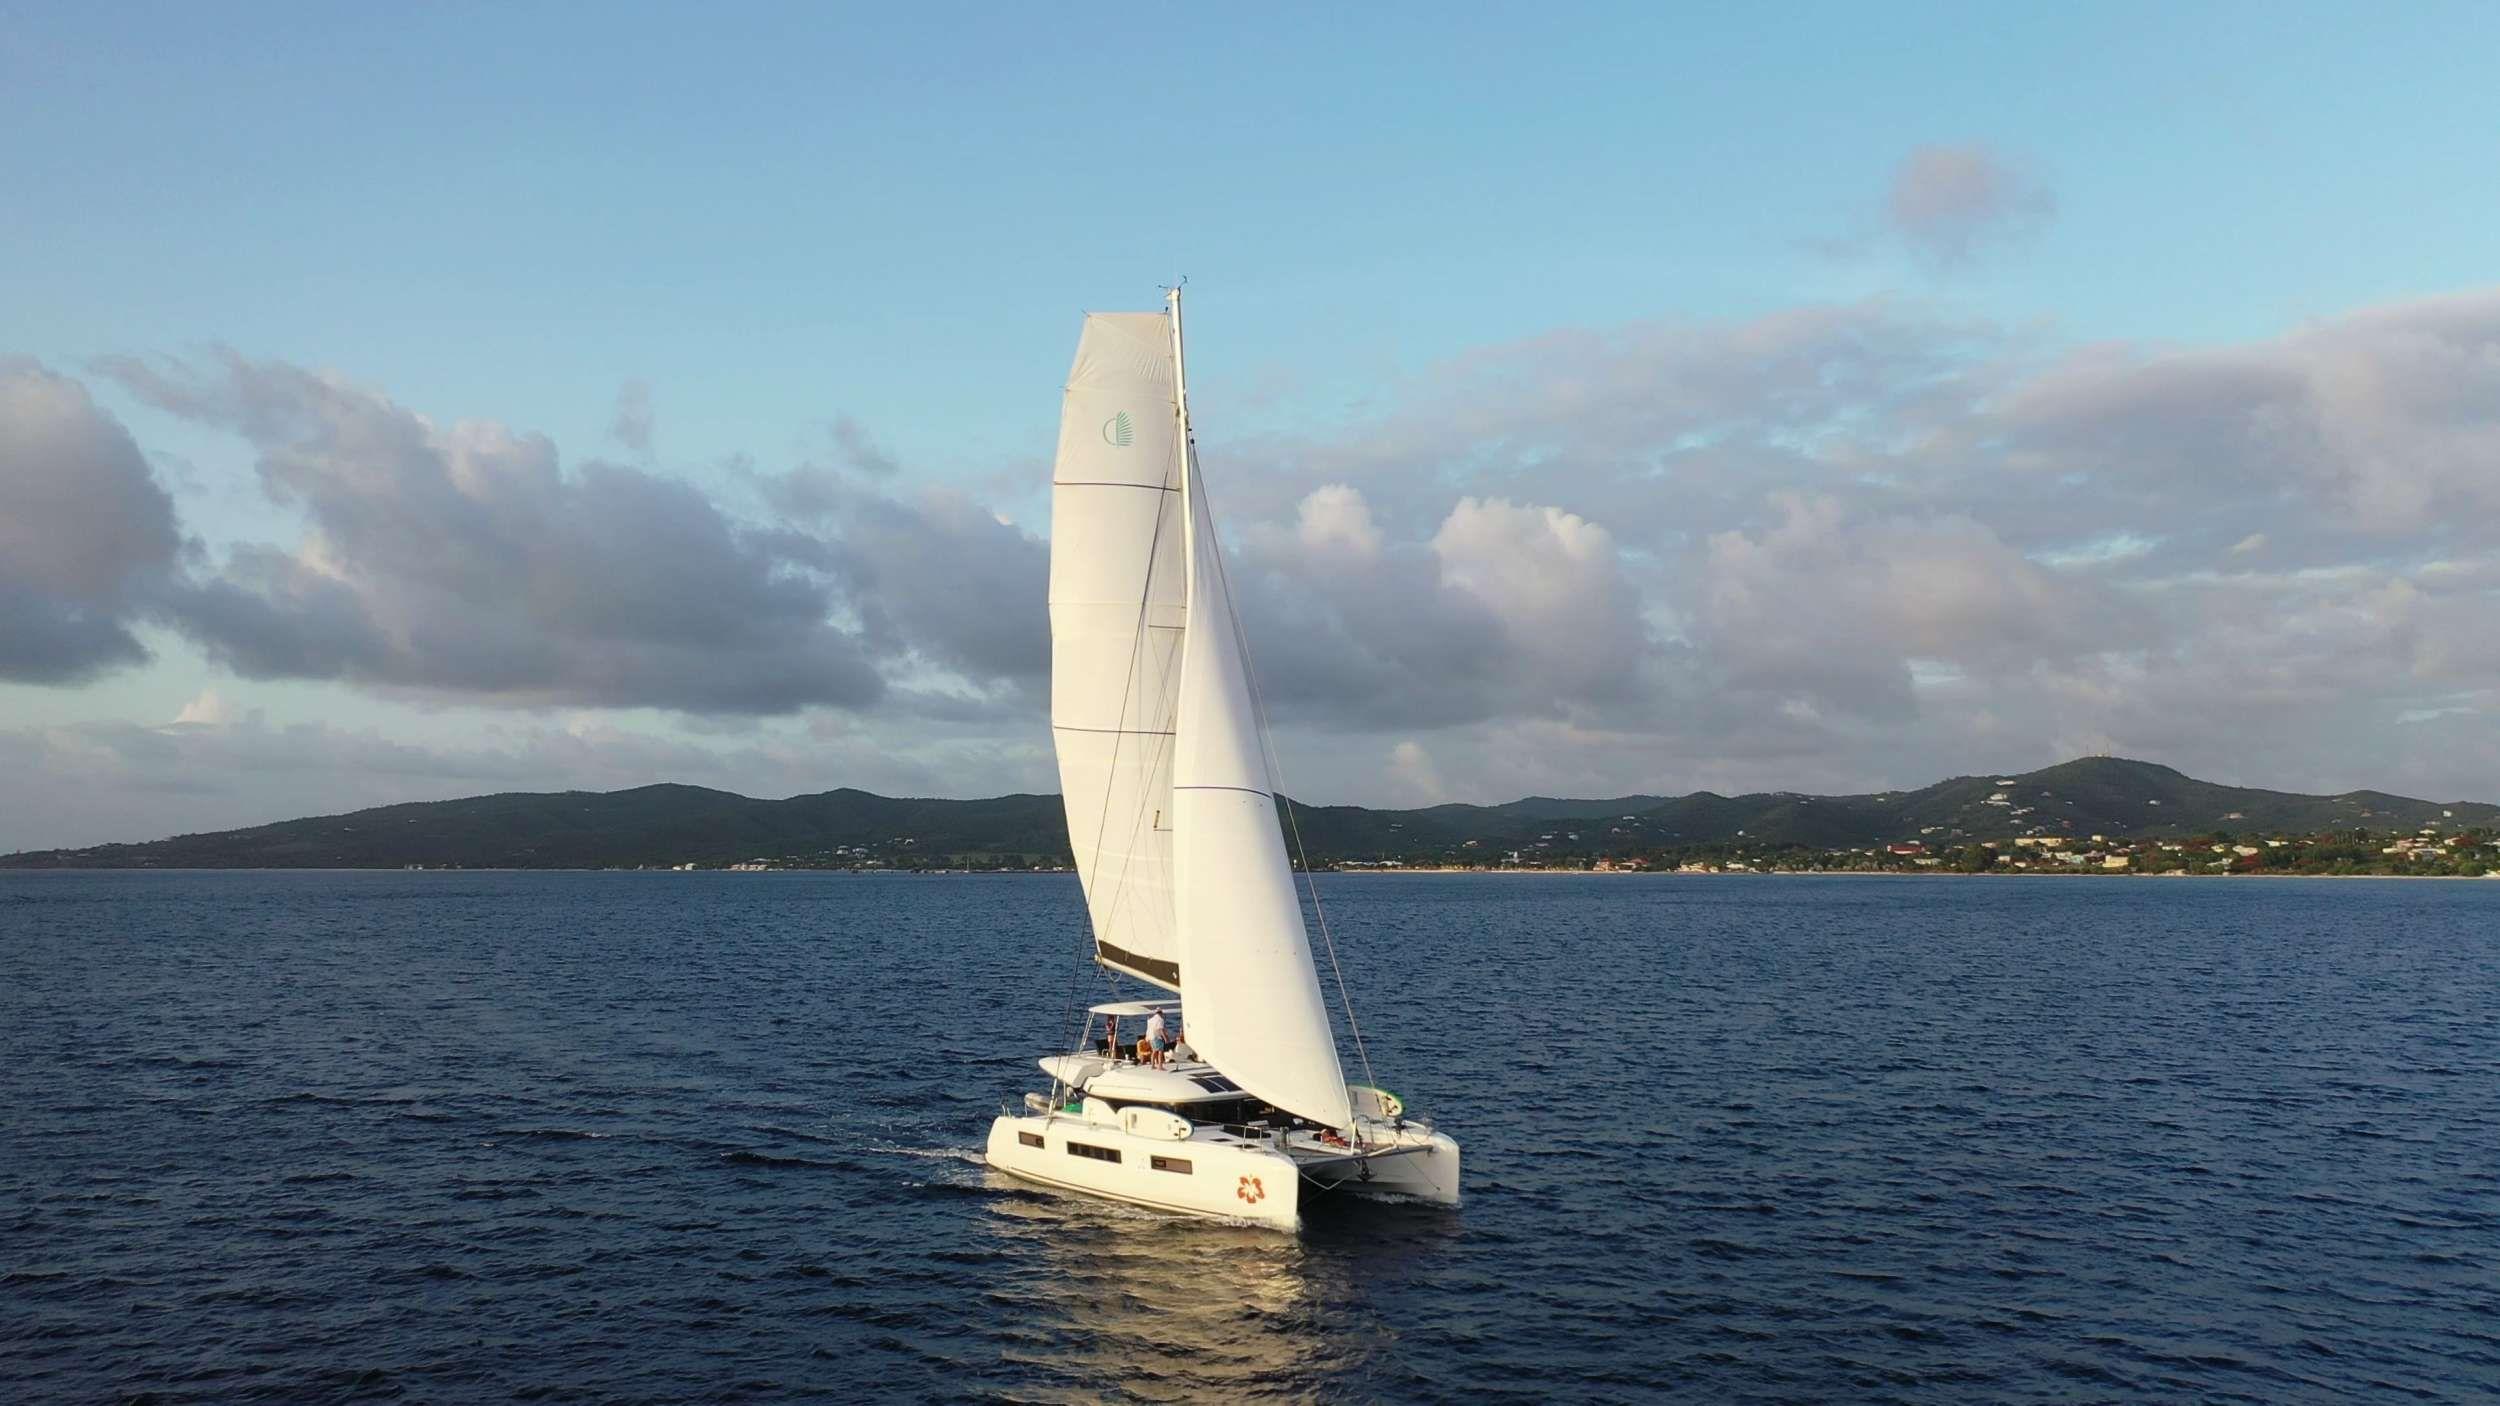 DELANA MAE - Lagoon 50 - 4 Cabins - St Thomas - St John - Virgin Islands